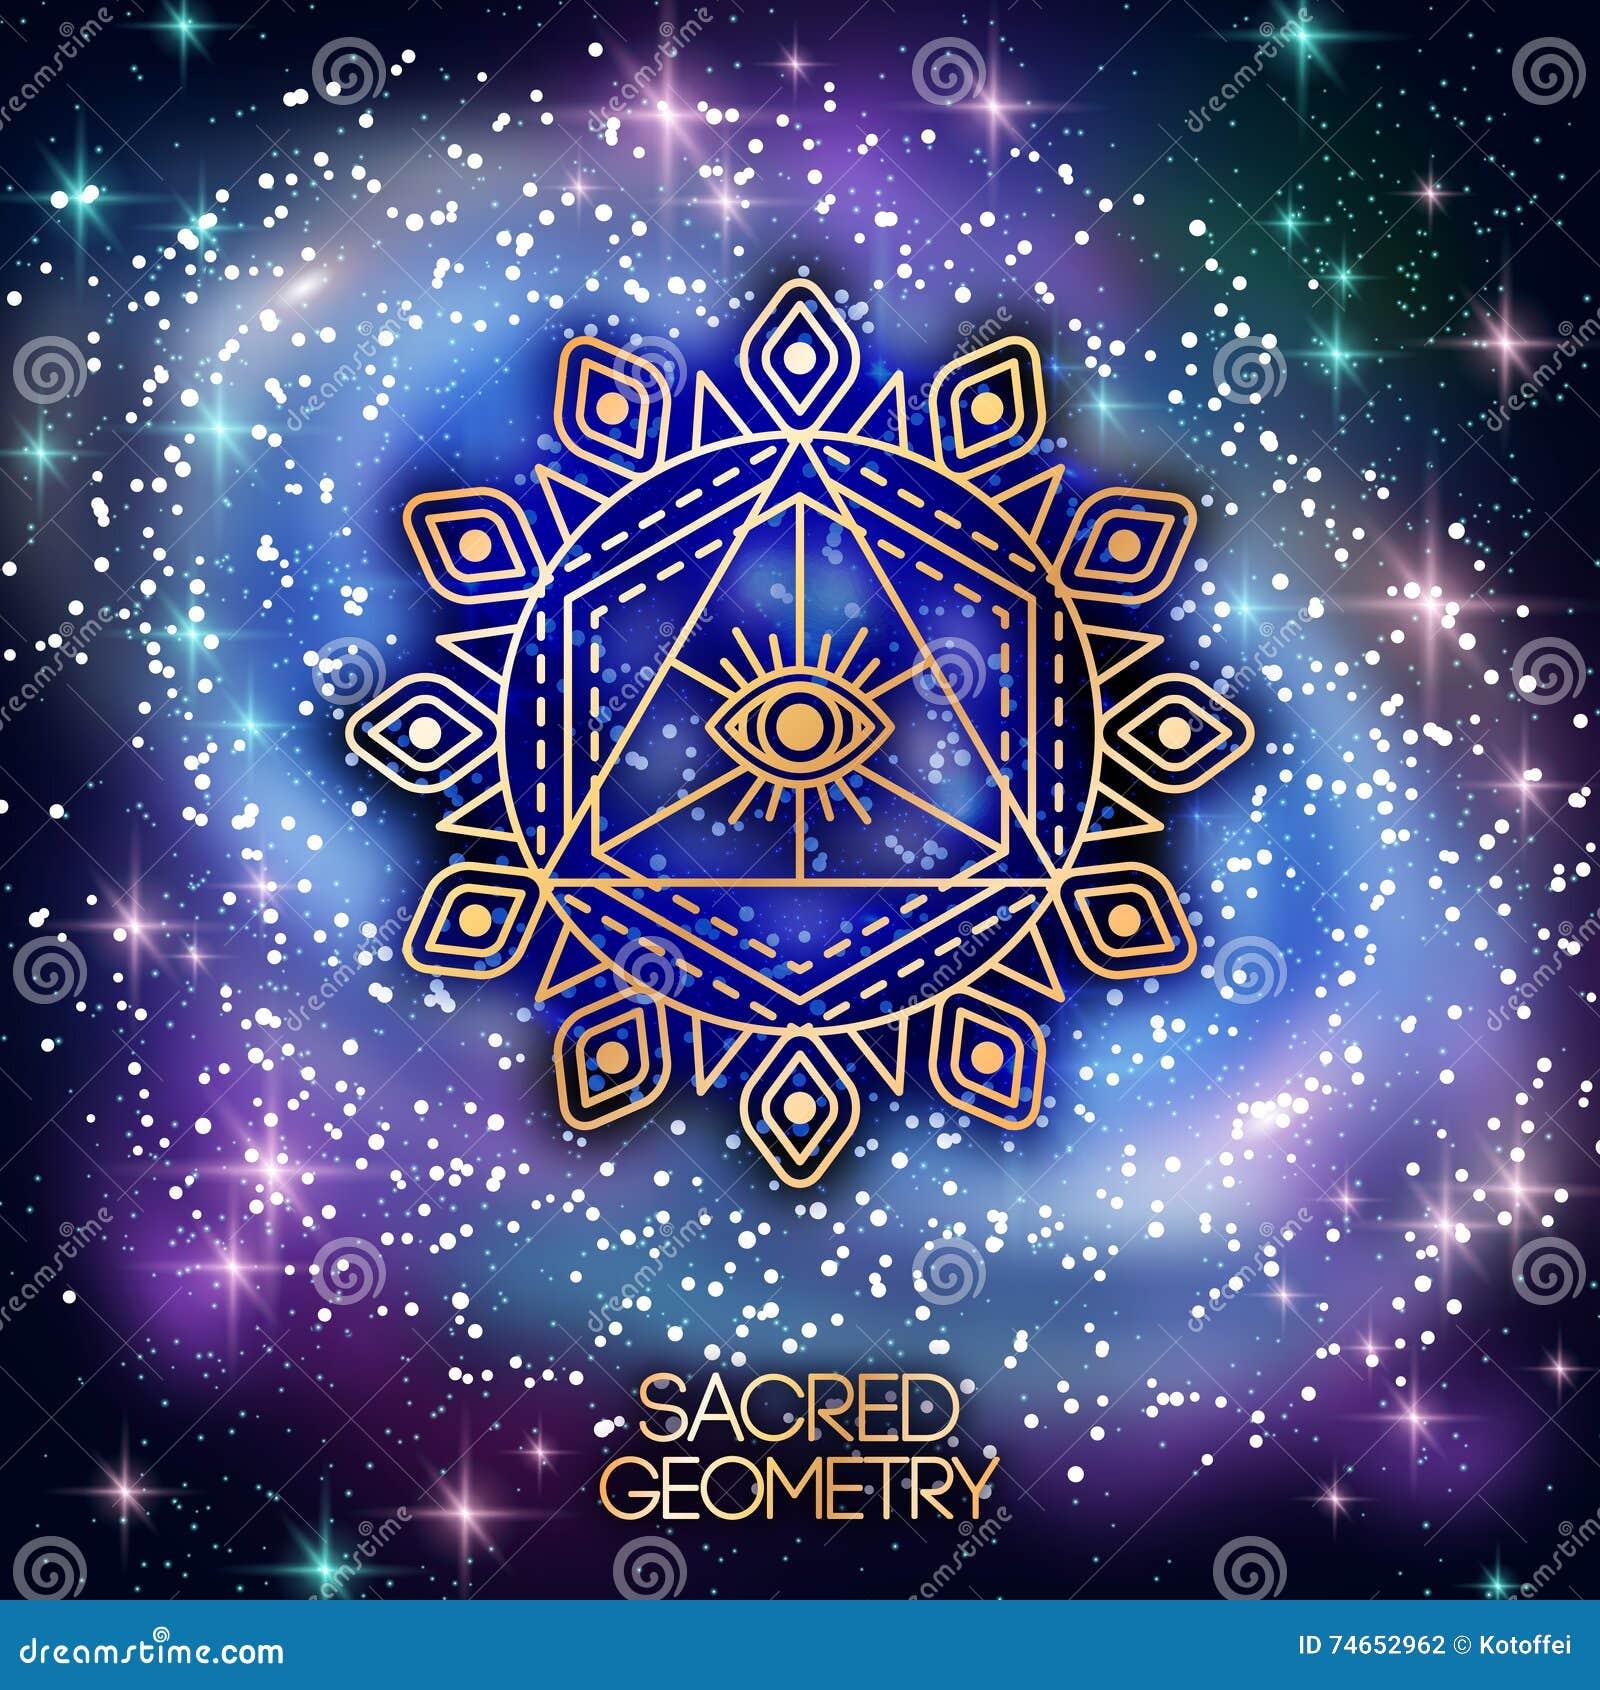 Sacred Geometry Emblem With Eye On Shining Galaxy Stock